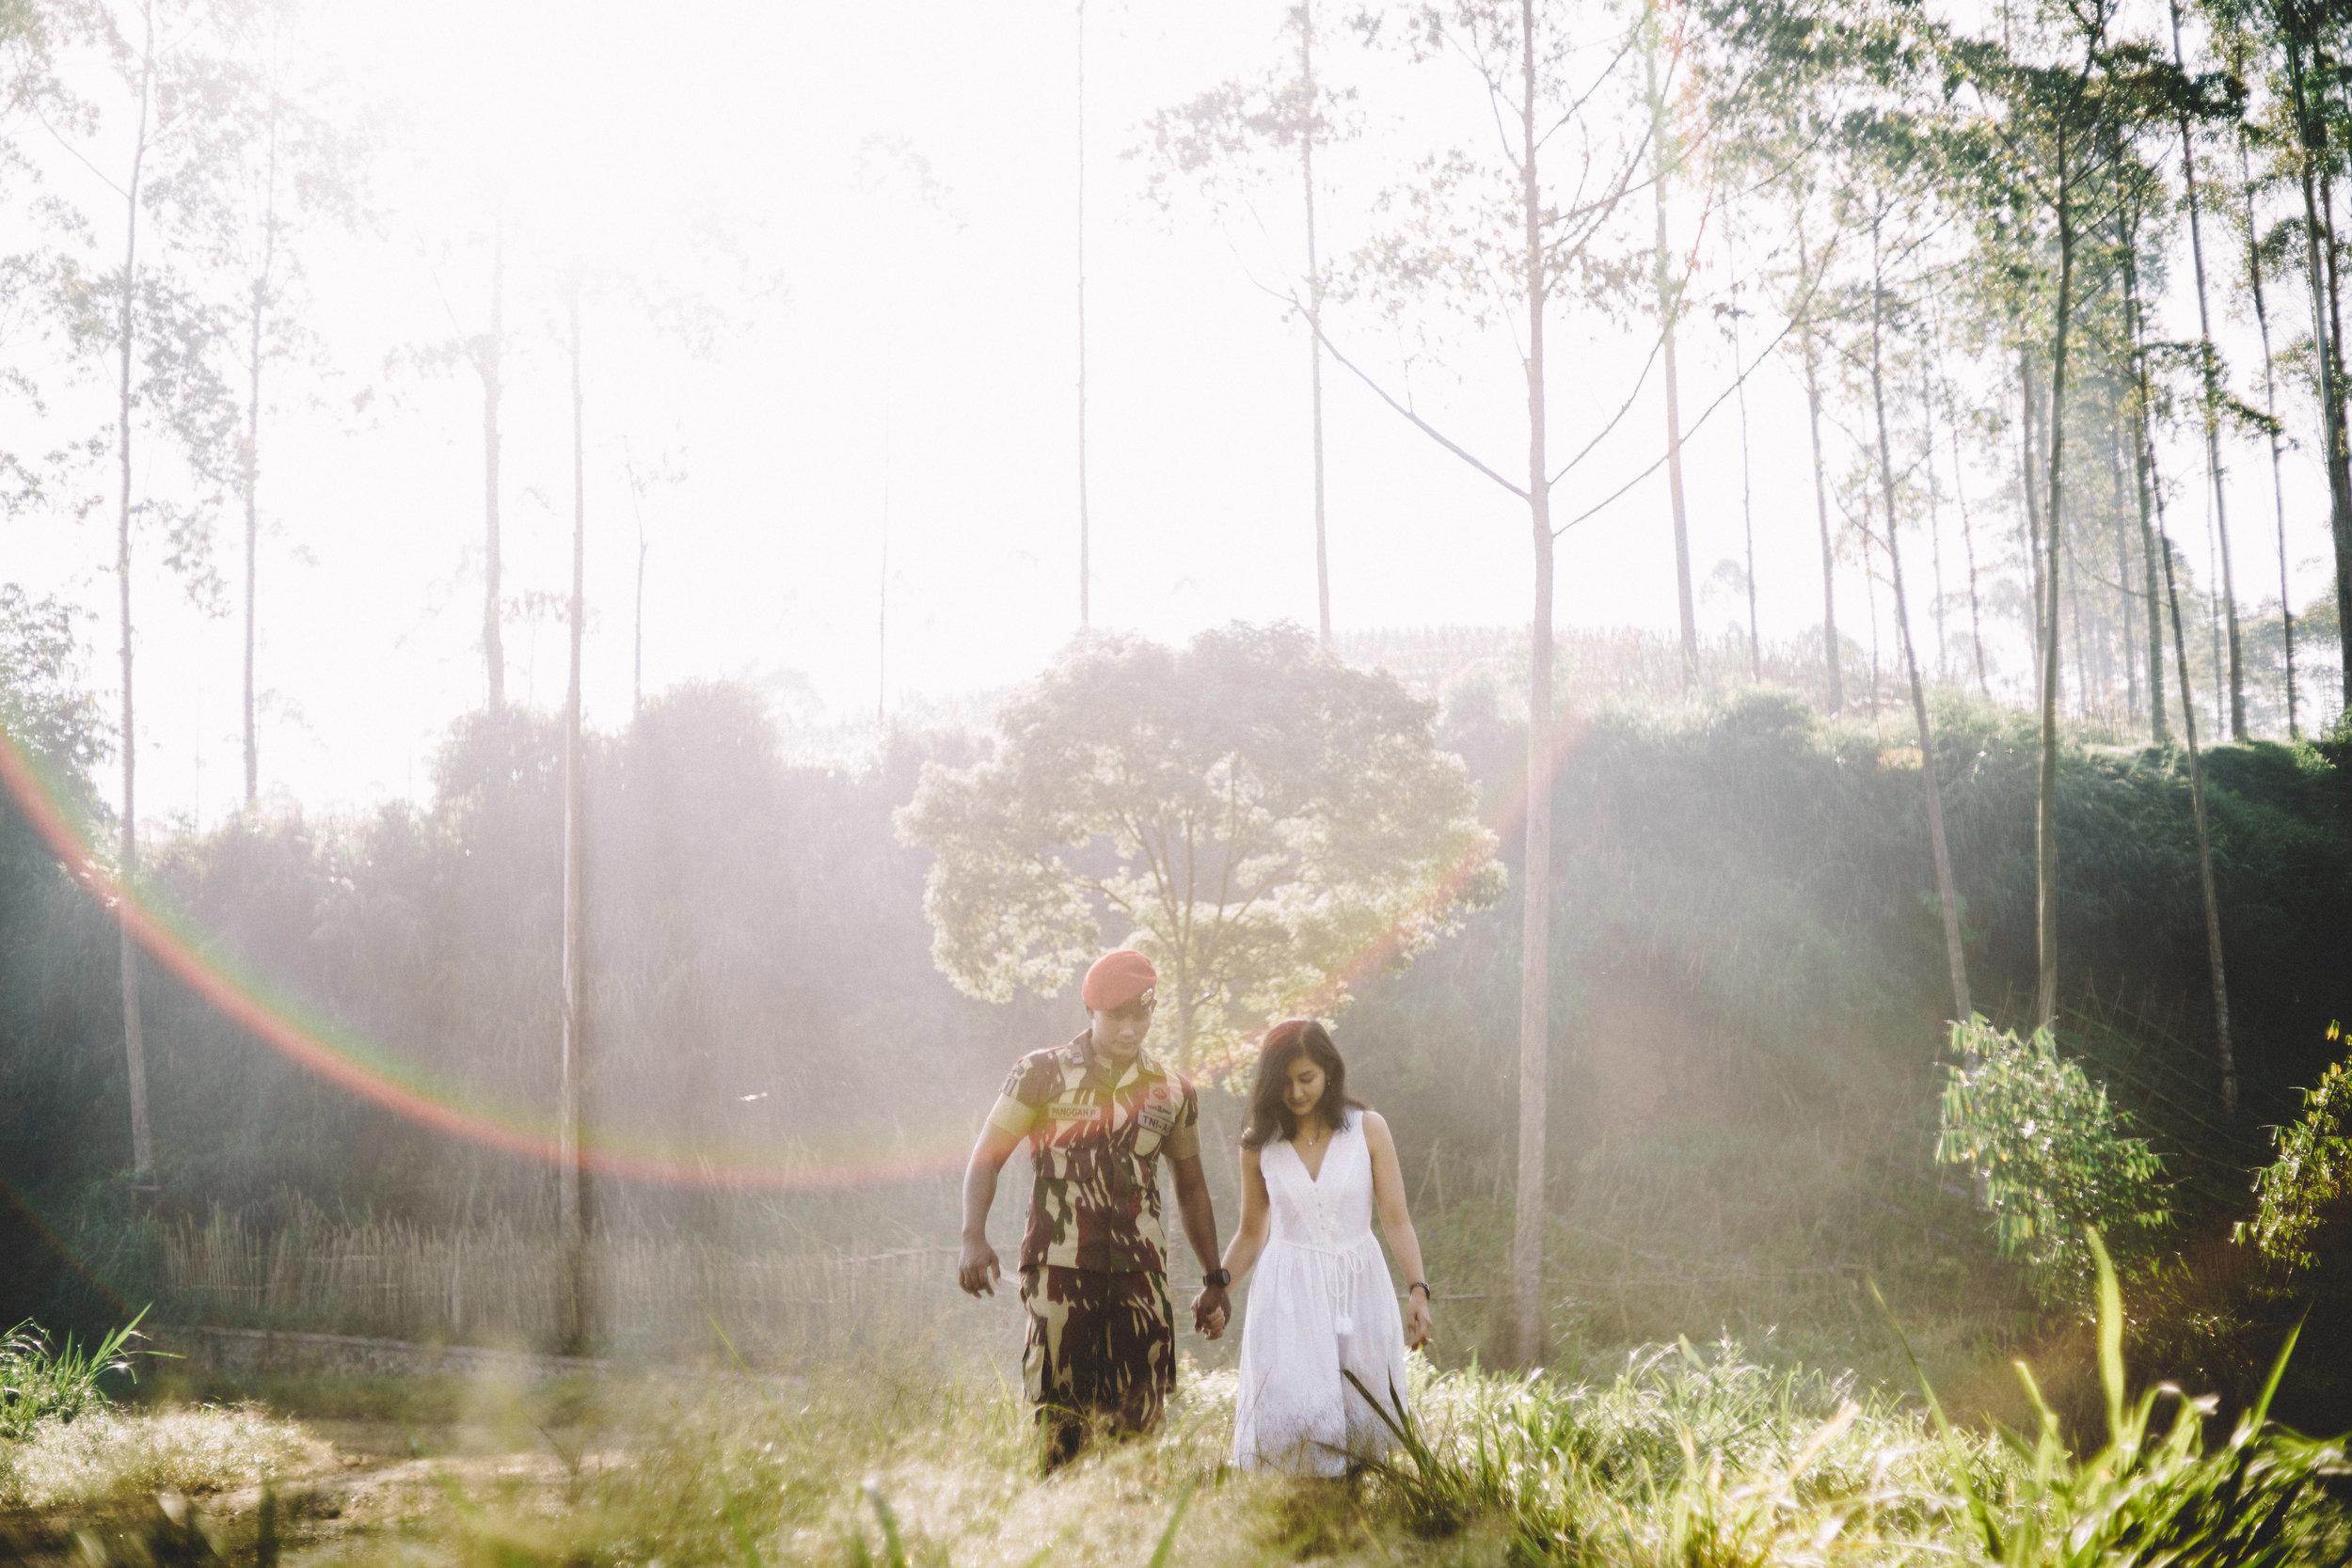 winny-panggah-couple-session-155.jpg